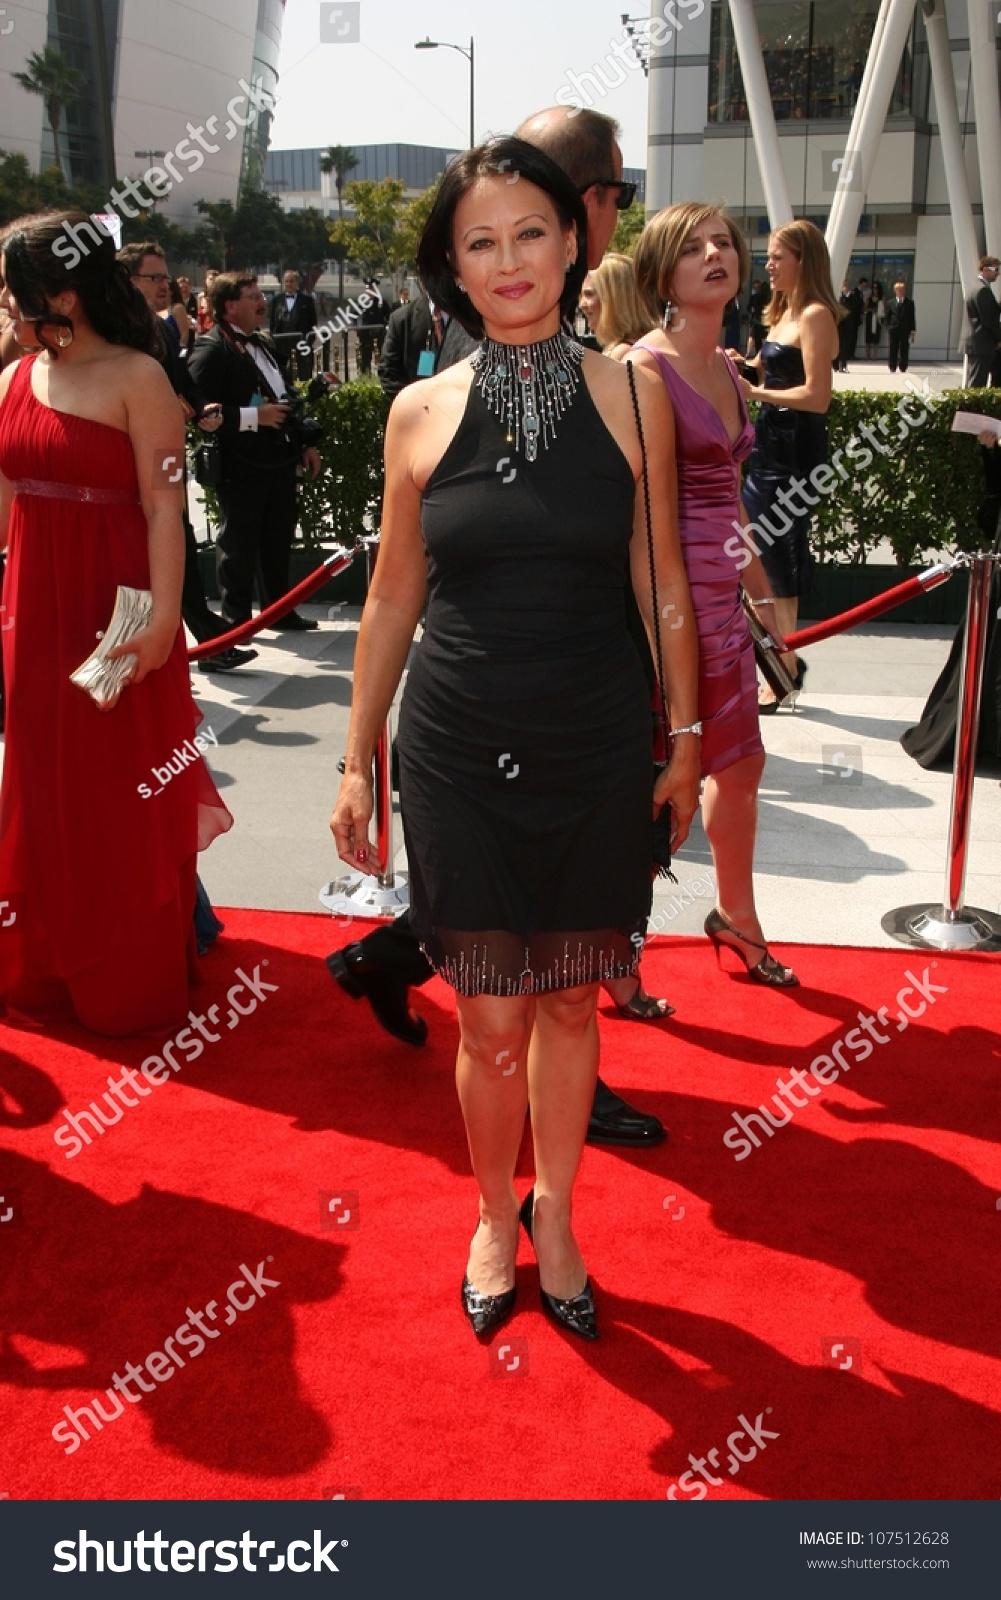 Communication on this topic: Michelle Alves BRA 2 2002-2003, janine-gray/